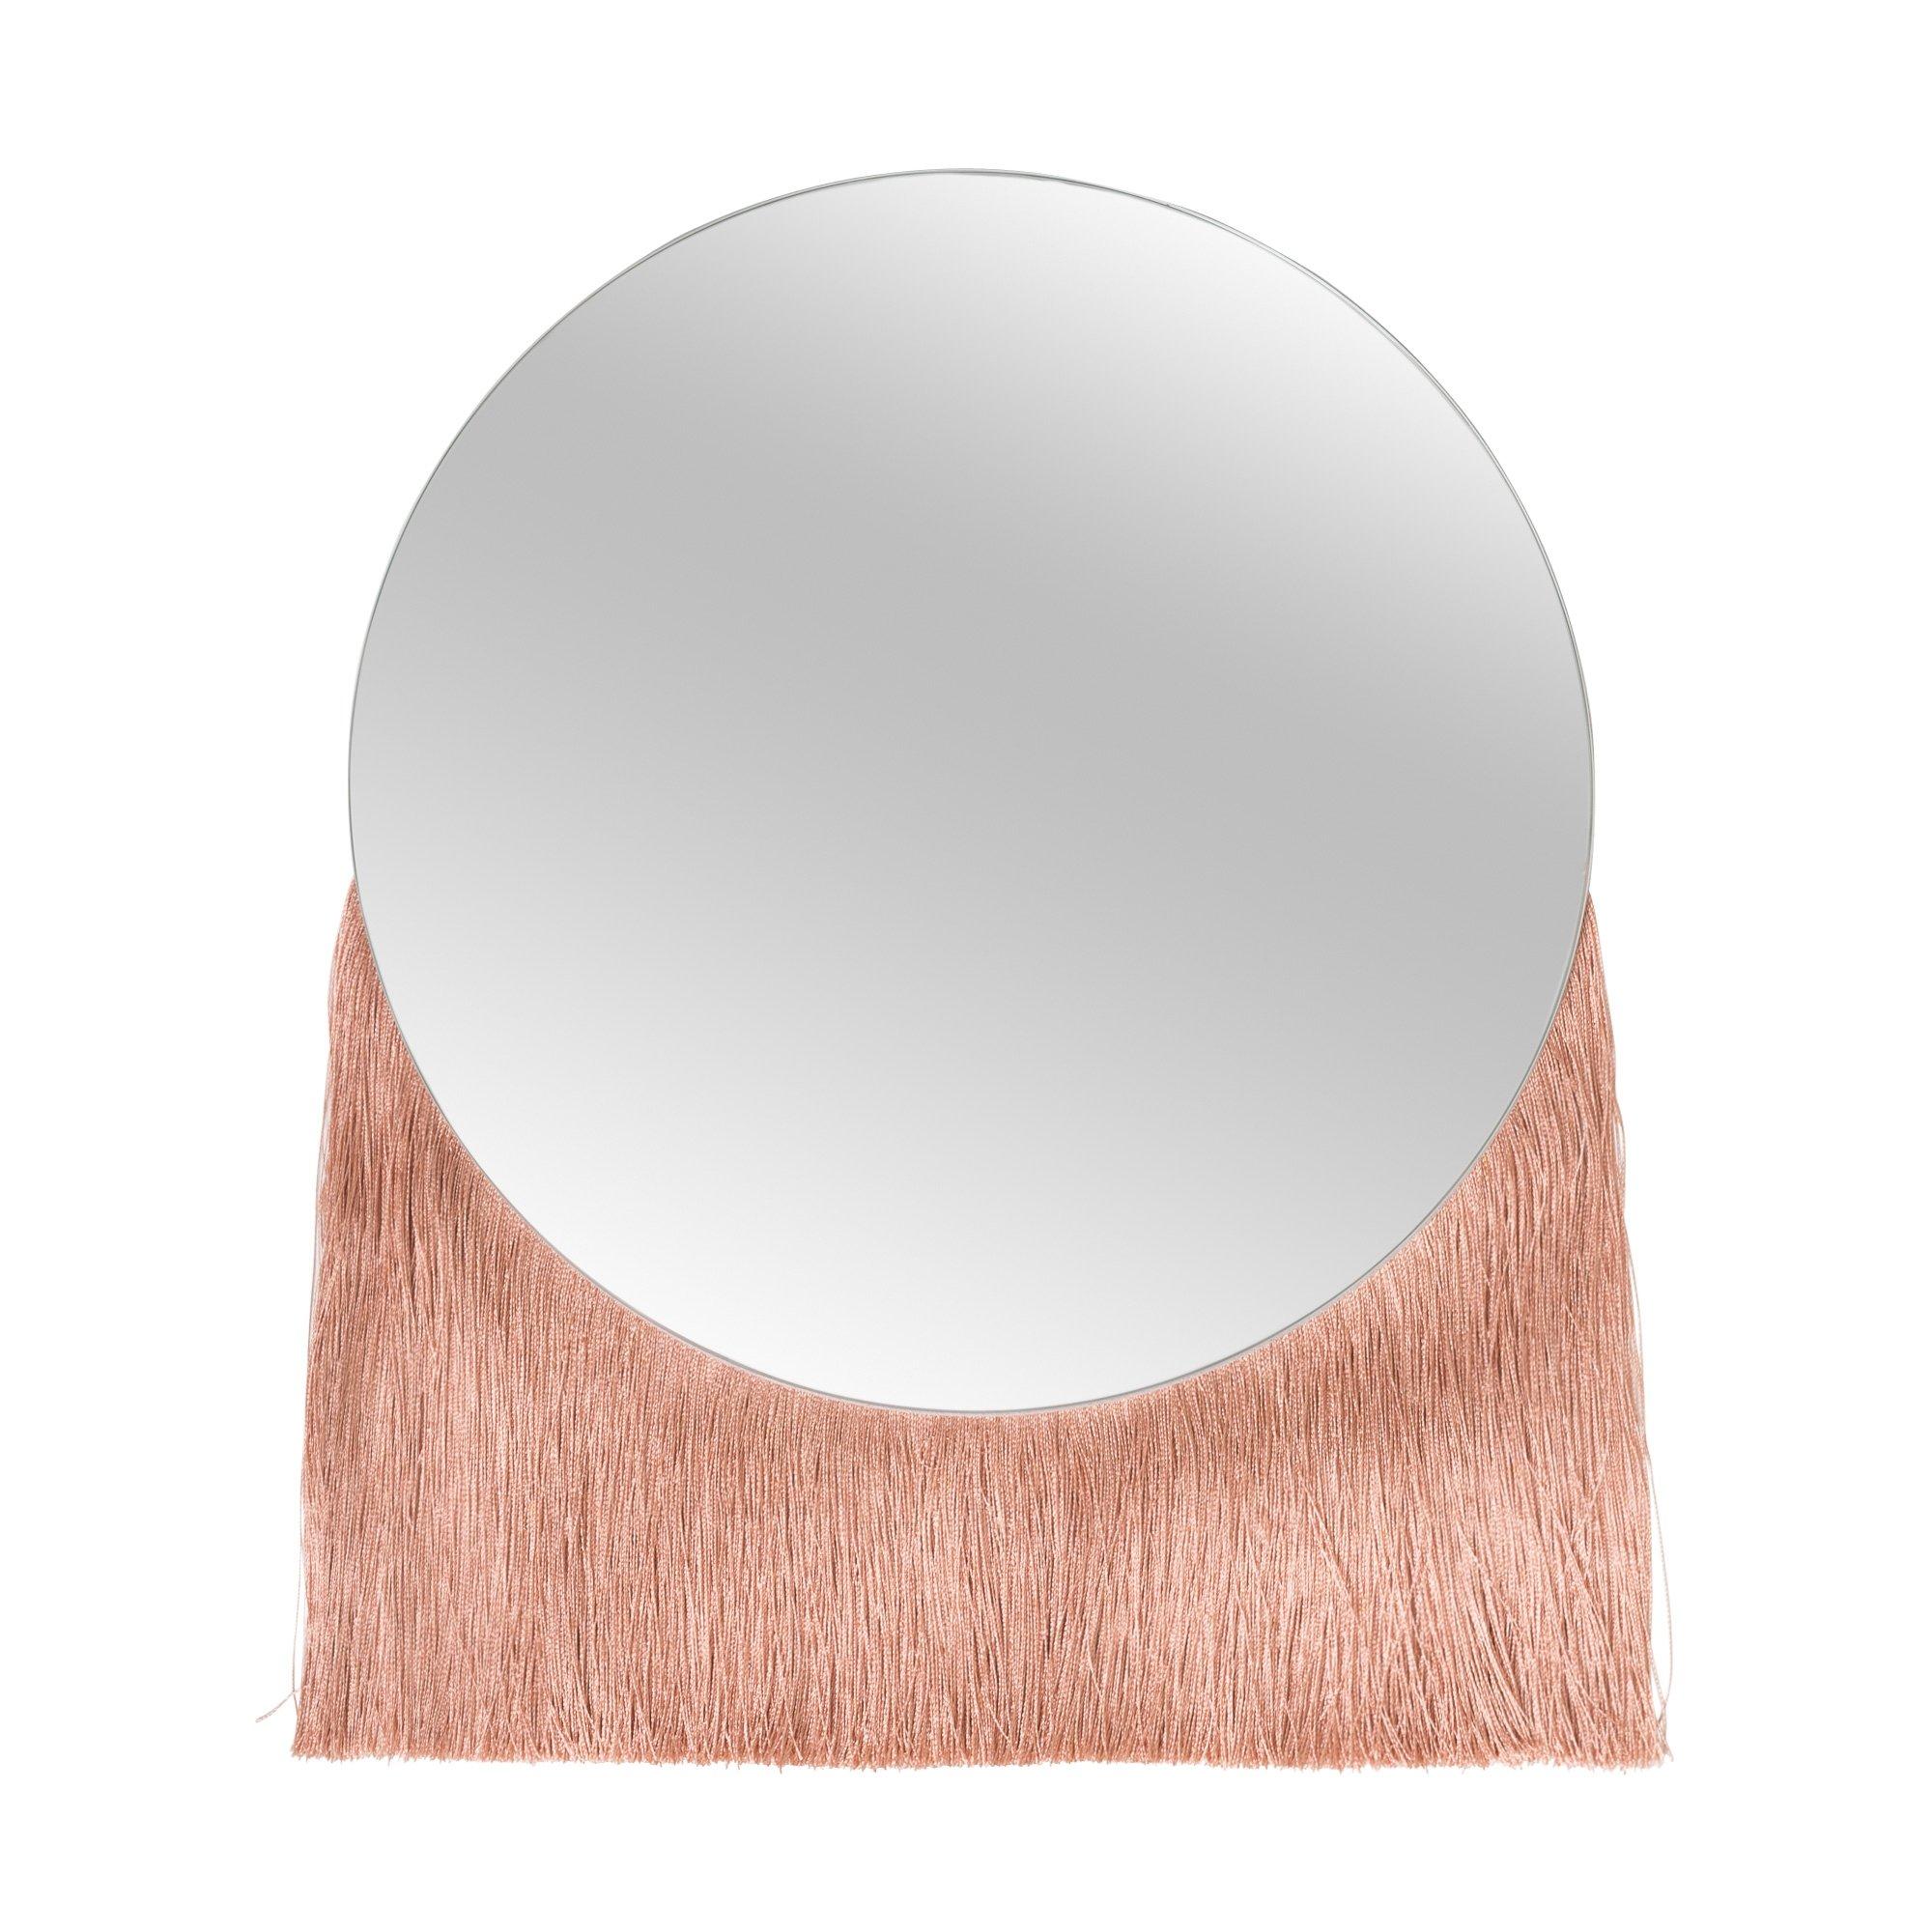 Mirrors | Wall Mirrors & Dressing Table Mirrors | Oliver Bonas